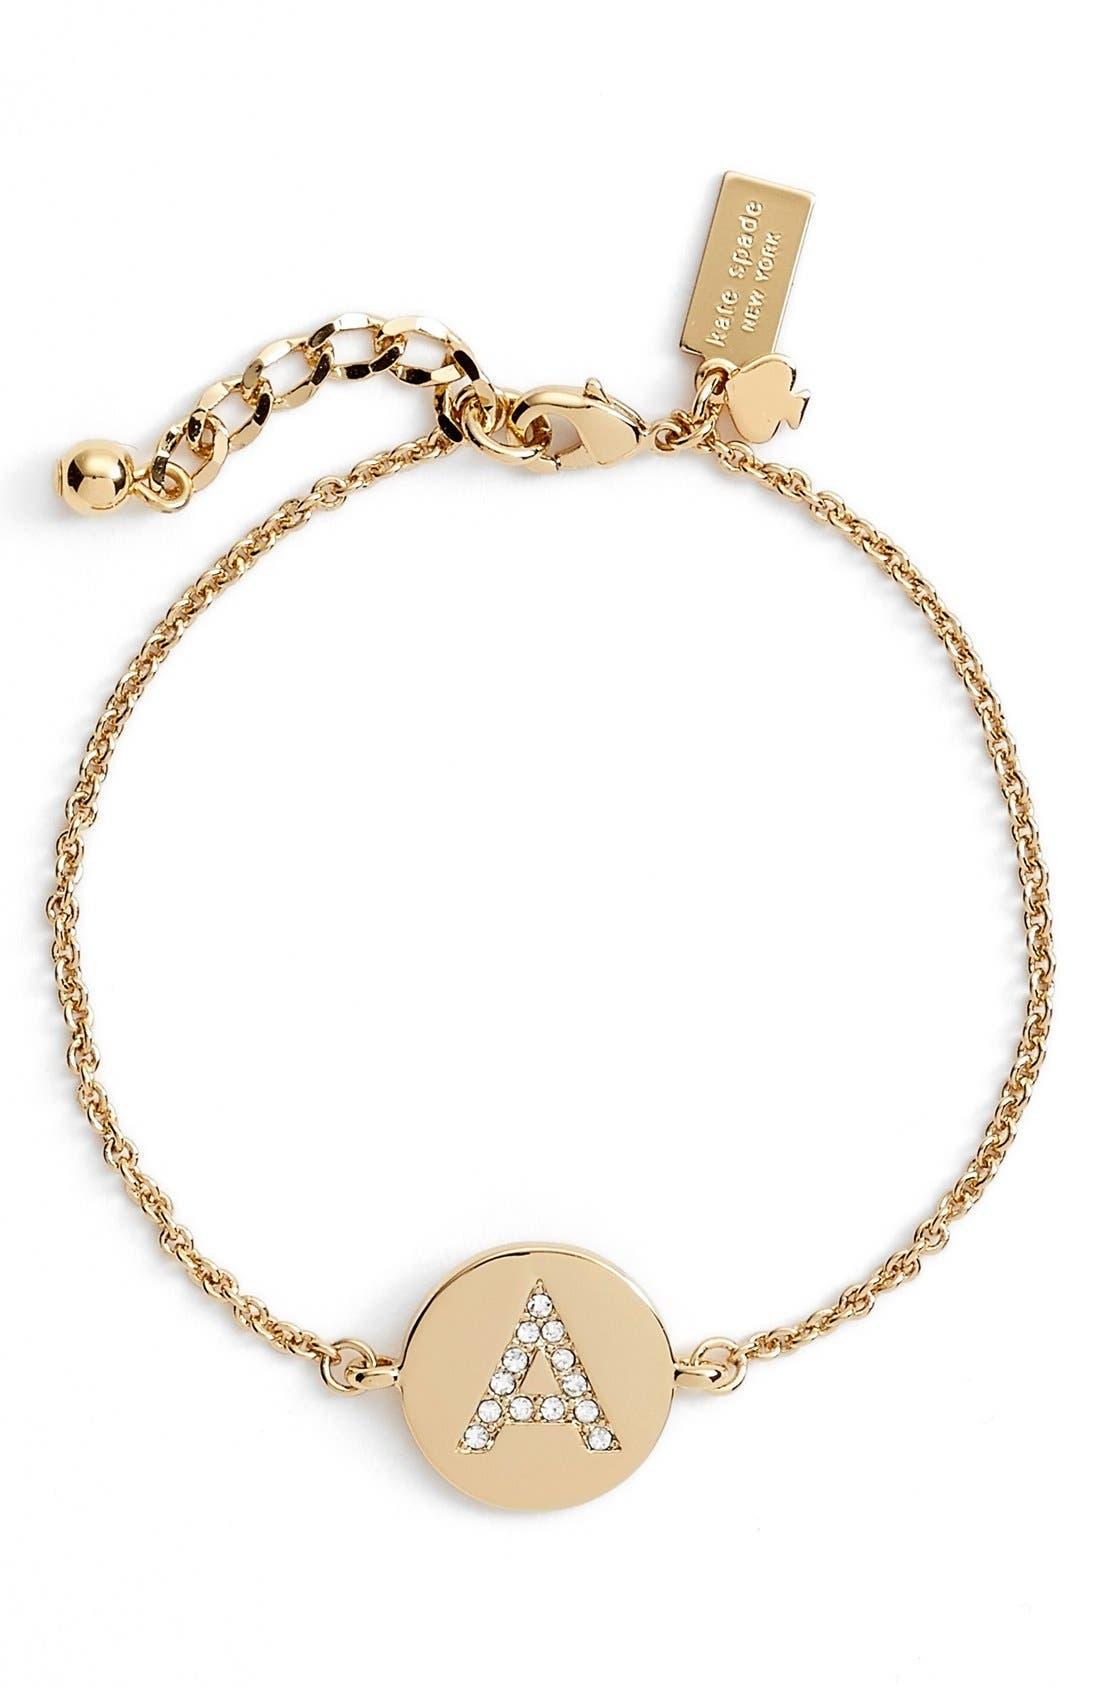 Alternate Image 1 Selected - kate spade new york 'north court' pavé initial charm bracelet